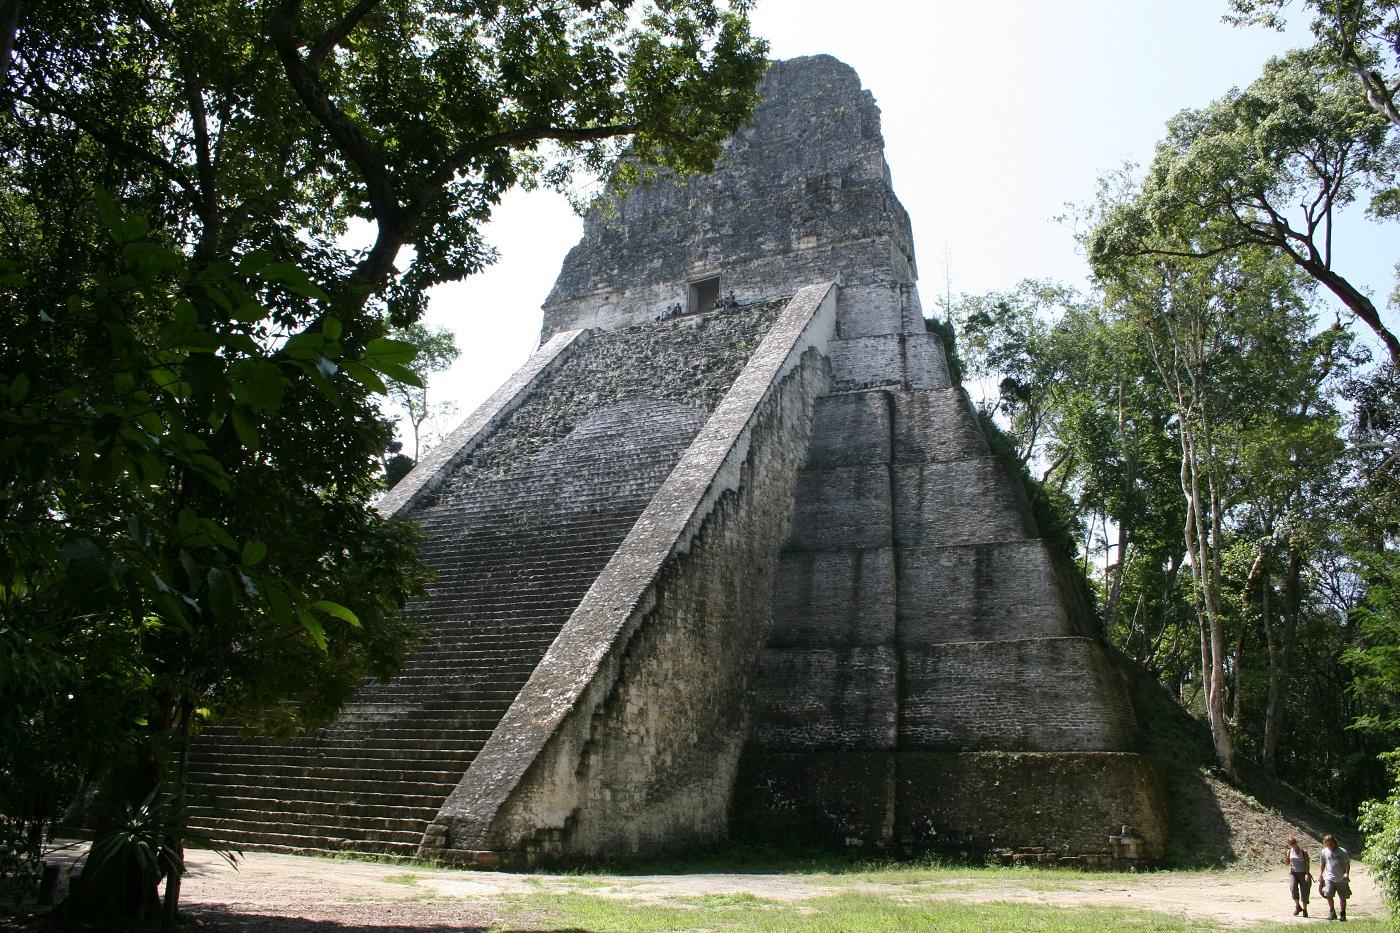 Tikal Guatemala (c) Anja Knorr